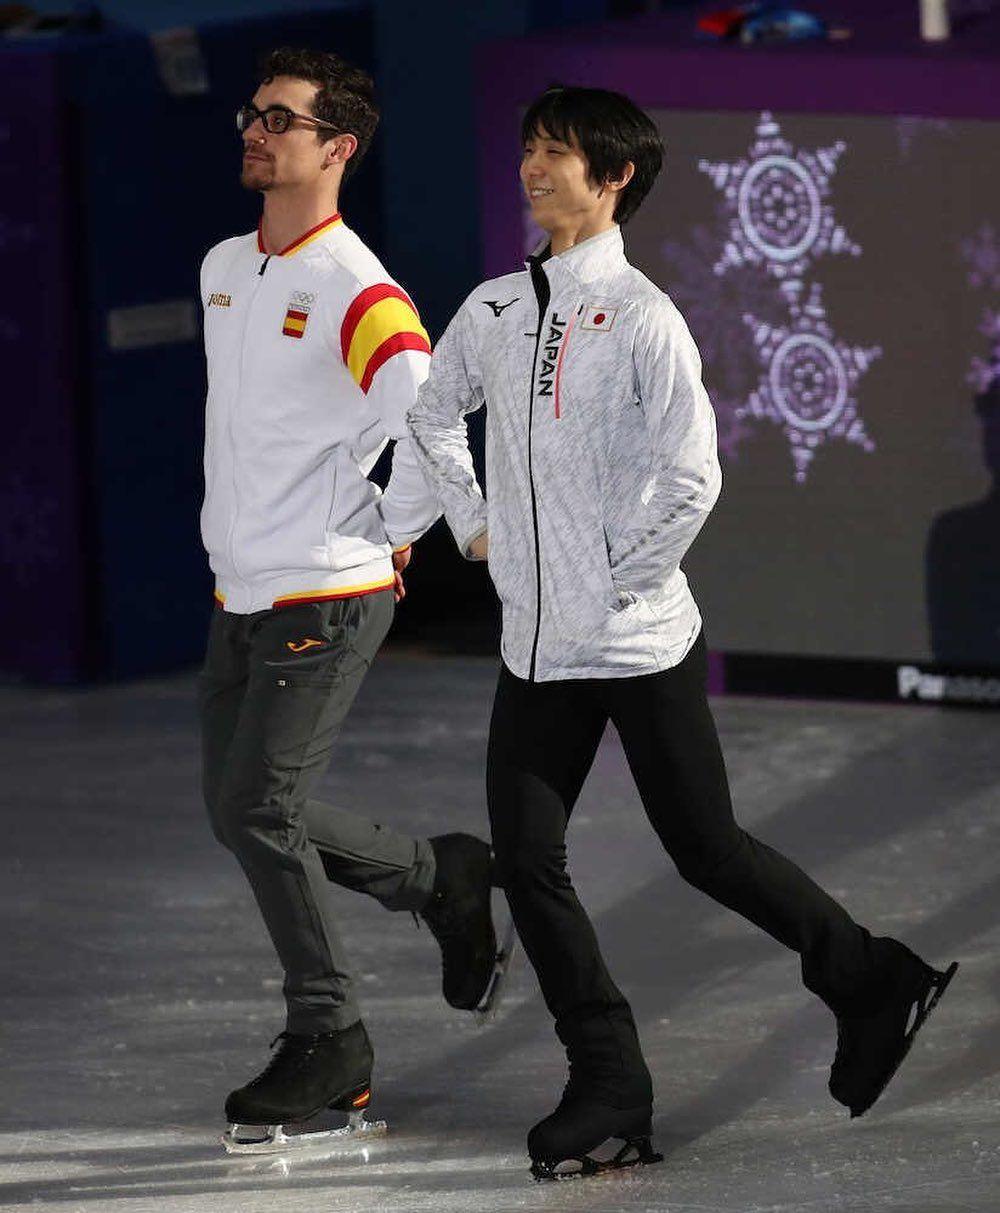 Yuzu On Ice On Instagram Posting Some Good Yuzuvier From The Olys Looks Like They Are Just Clown Hanyu Yuzuru Figure Skating Olympics Figure Skating